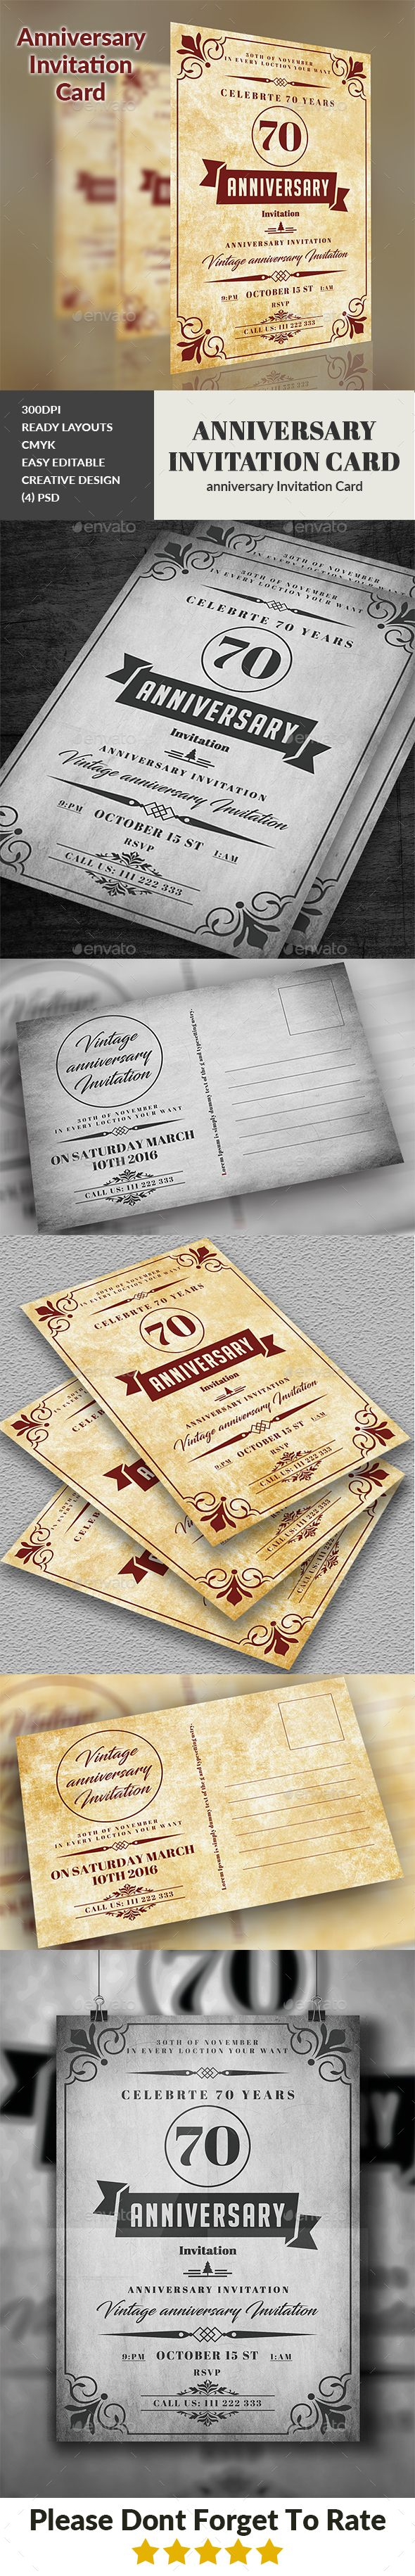 Anniversary Invitation Card 144 best Invitation Card